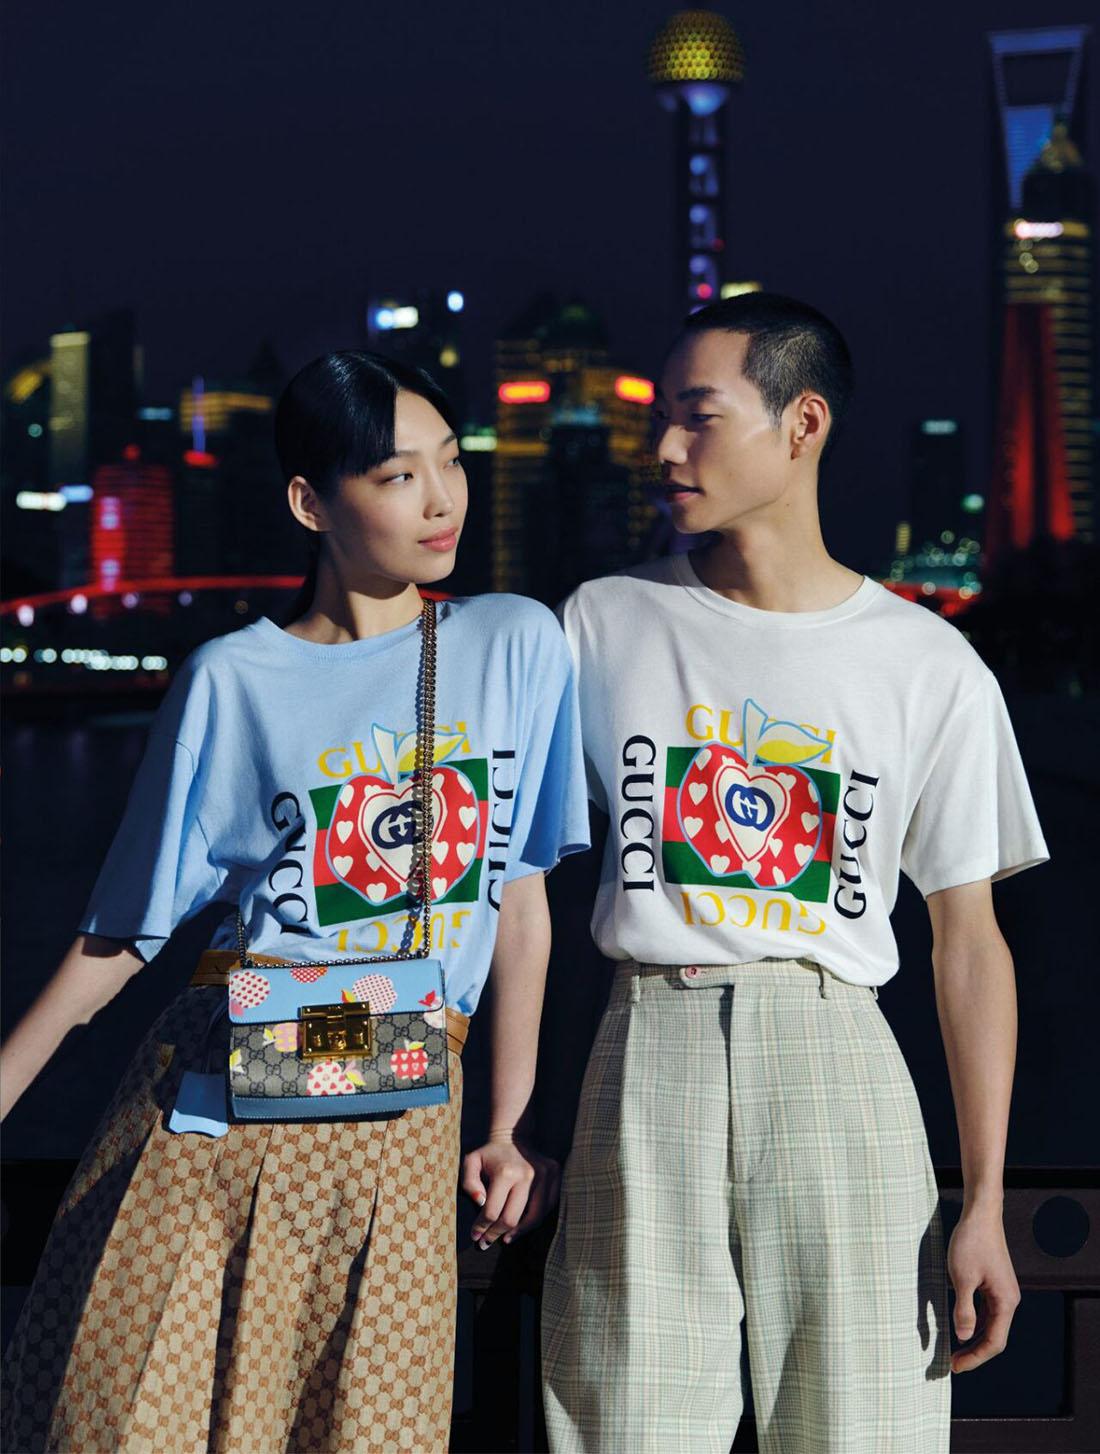 St-Valentin Chinois 2021 - GUCCI Les Pommes